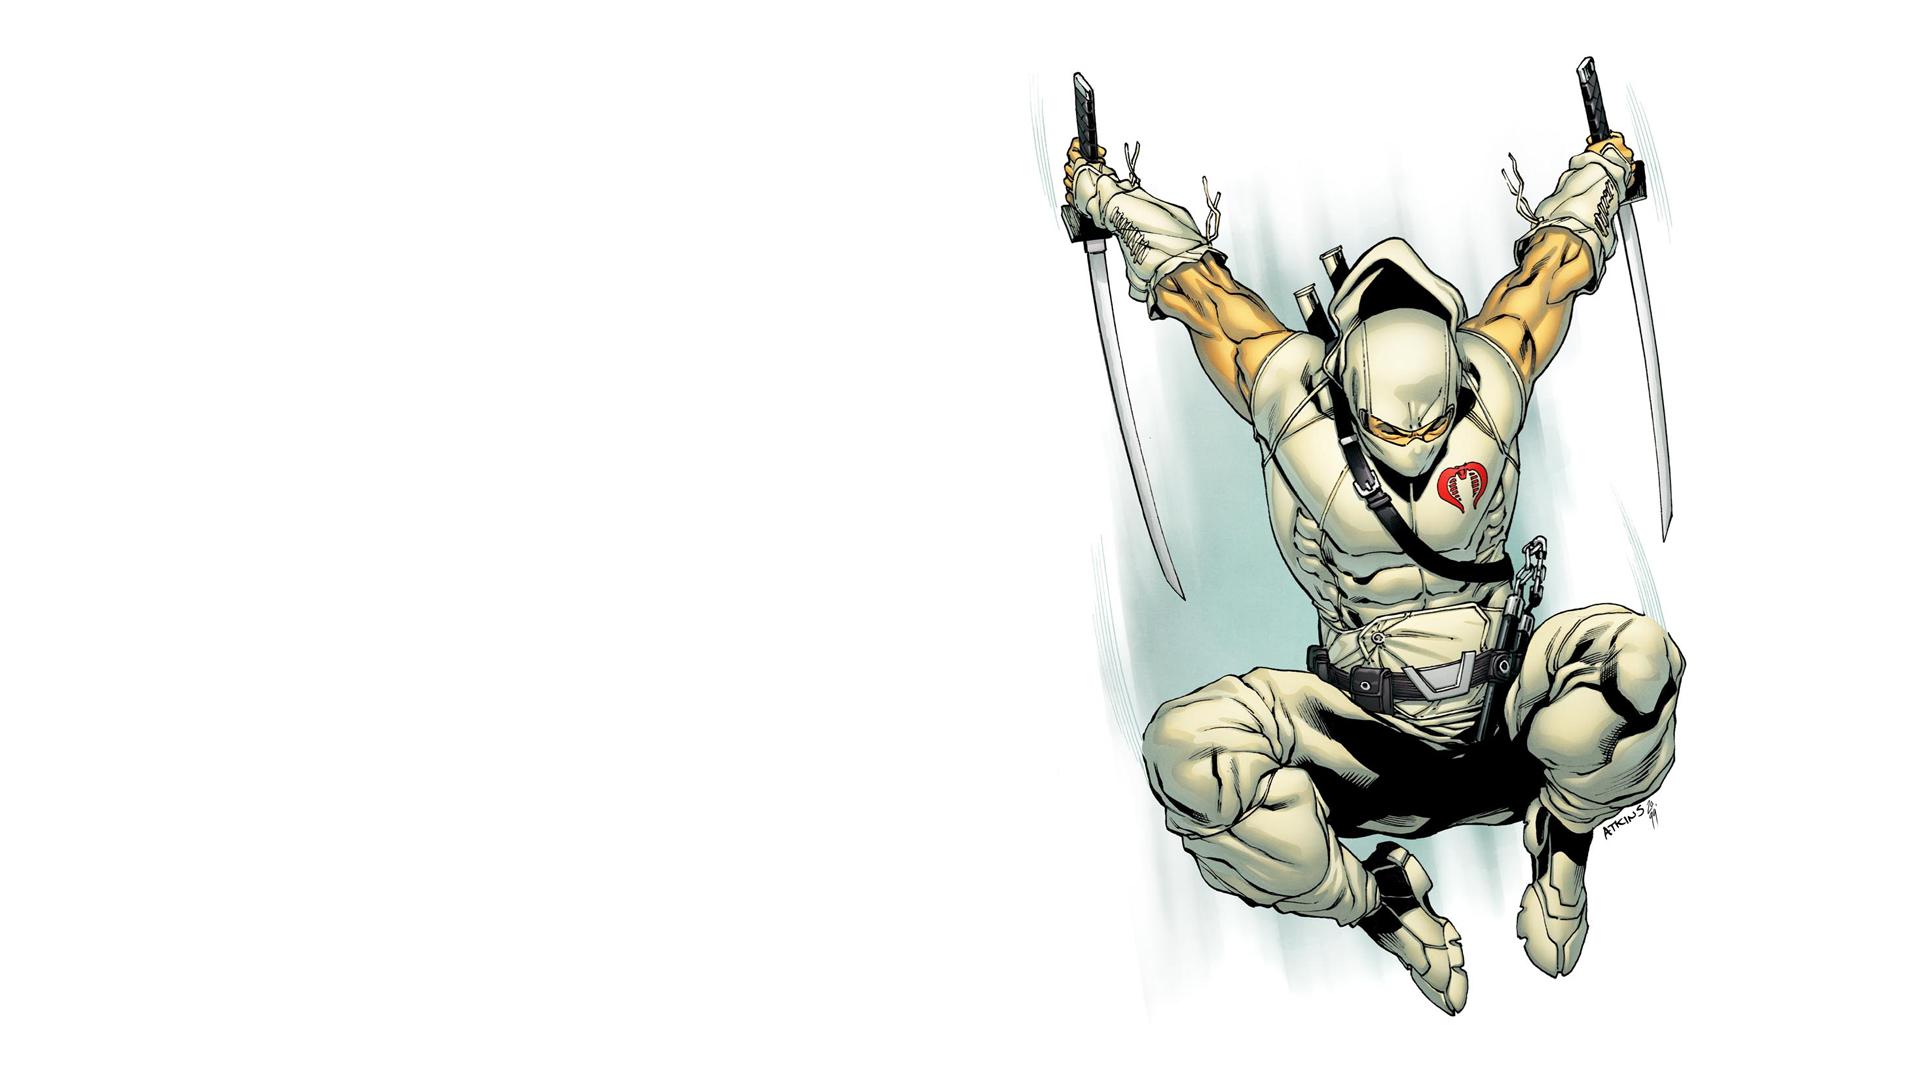 G.I. Joe Full HD Wallpaper And Background Image